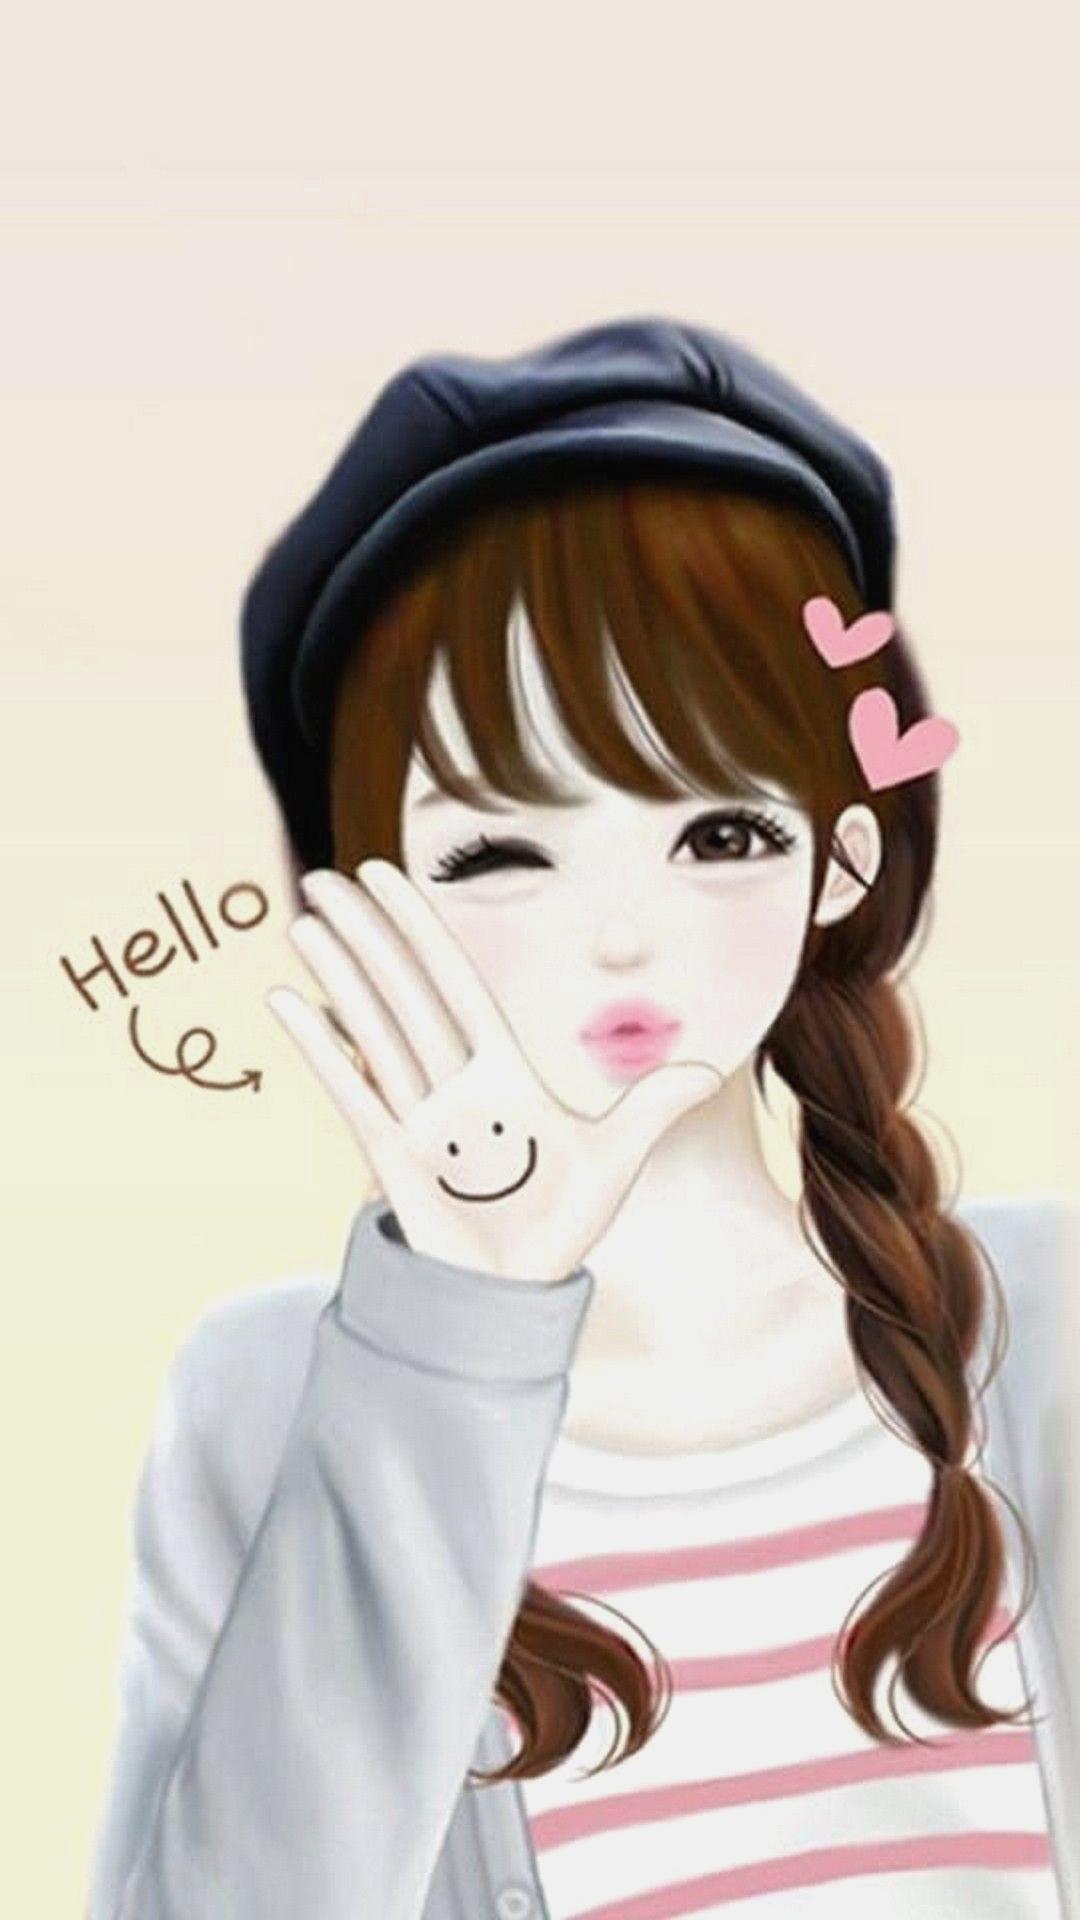 korean cartoon girl drawing 2